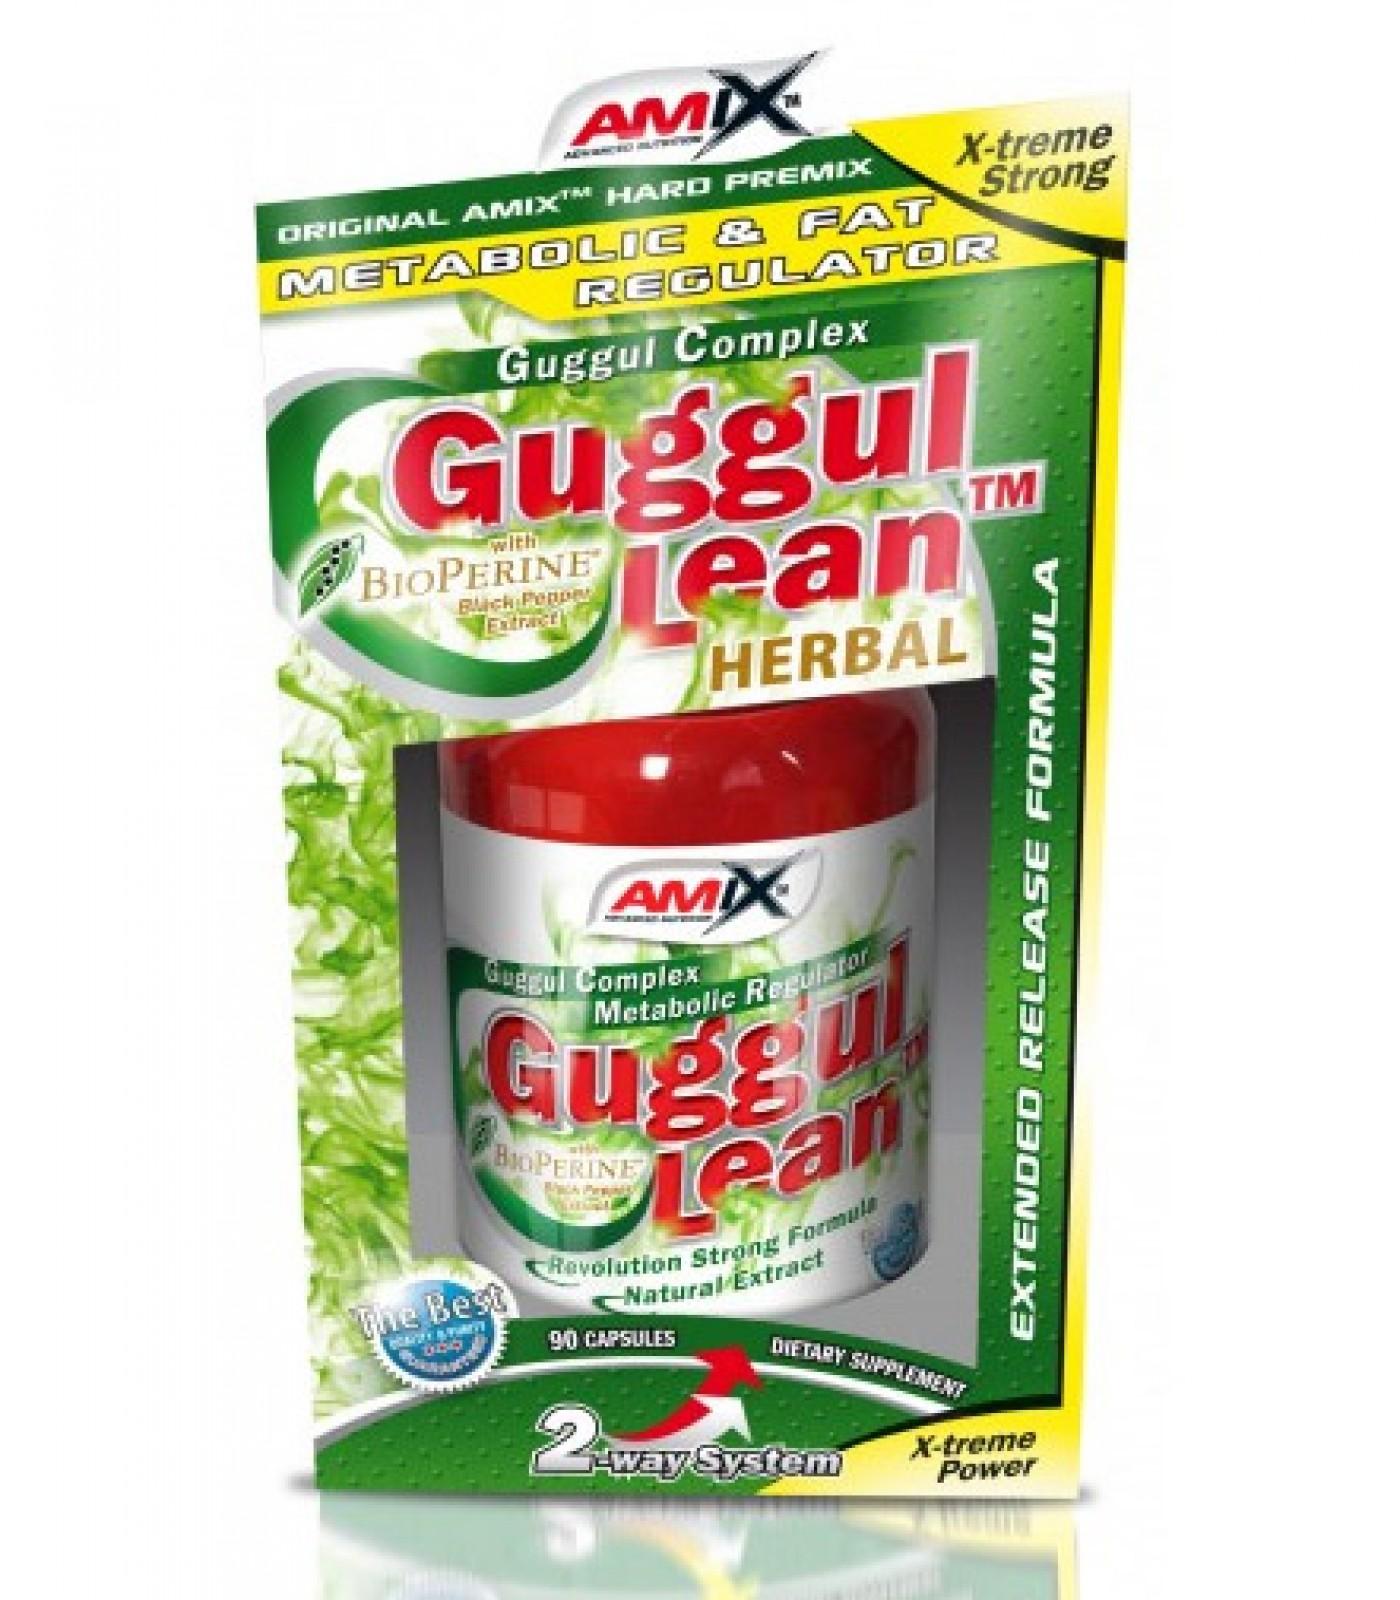 Amix - GuggulLean / 90 caps.